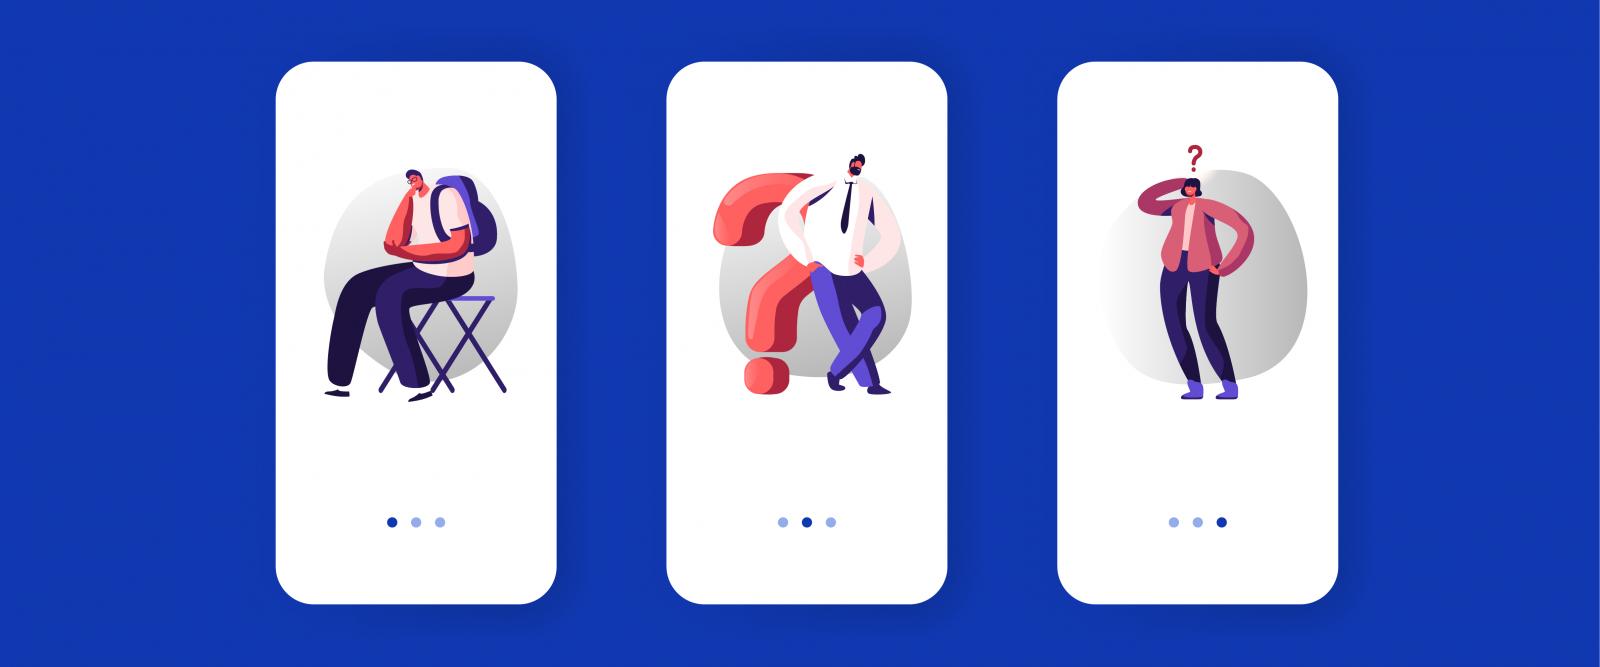 Mobile-app-questions